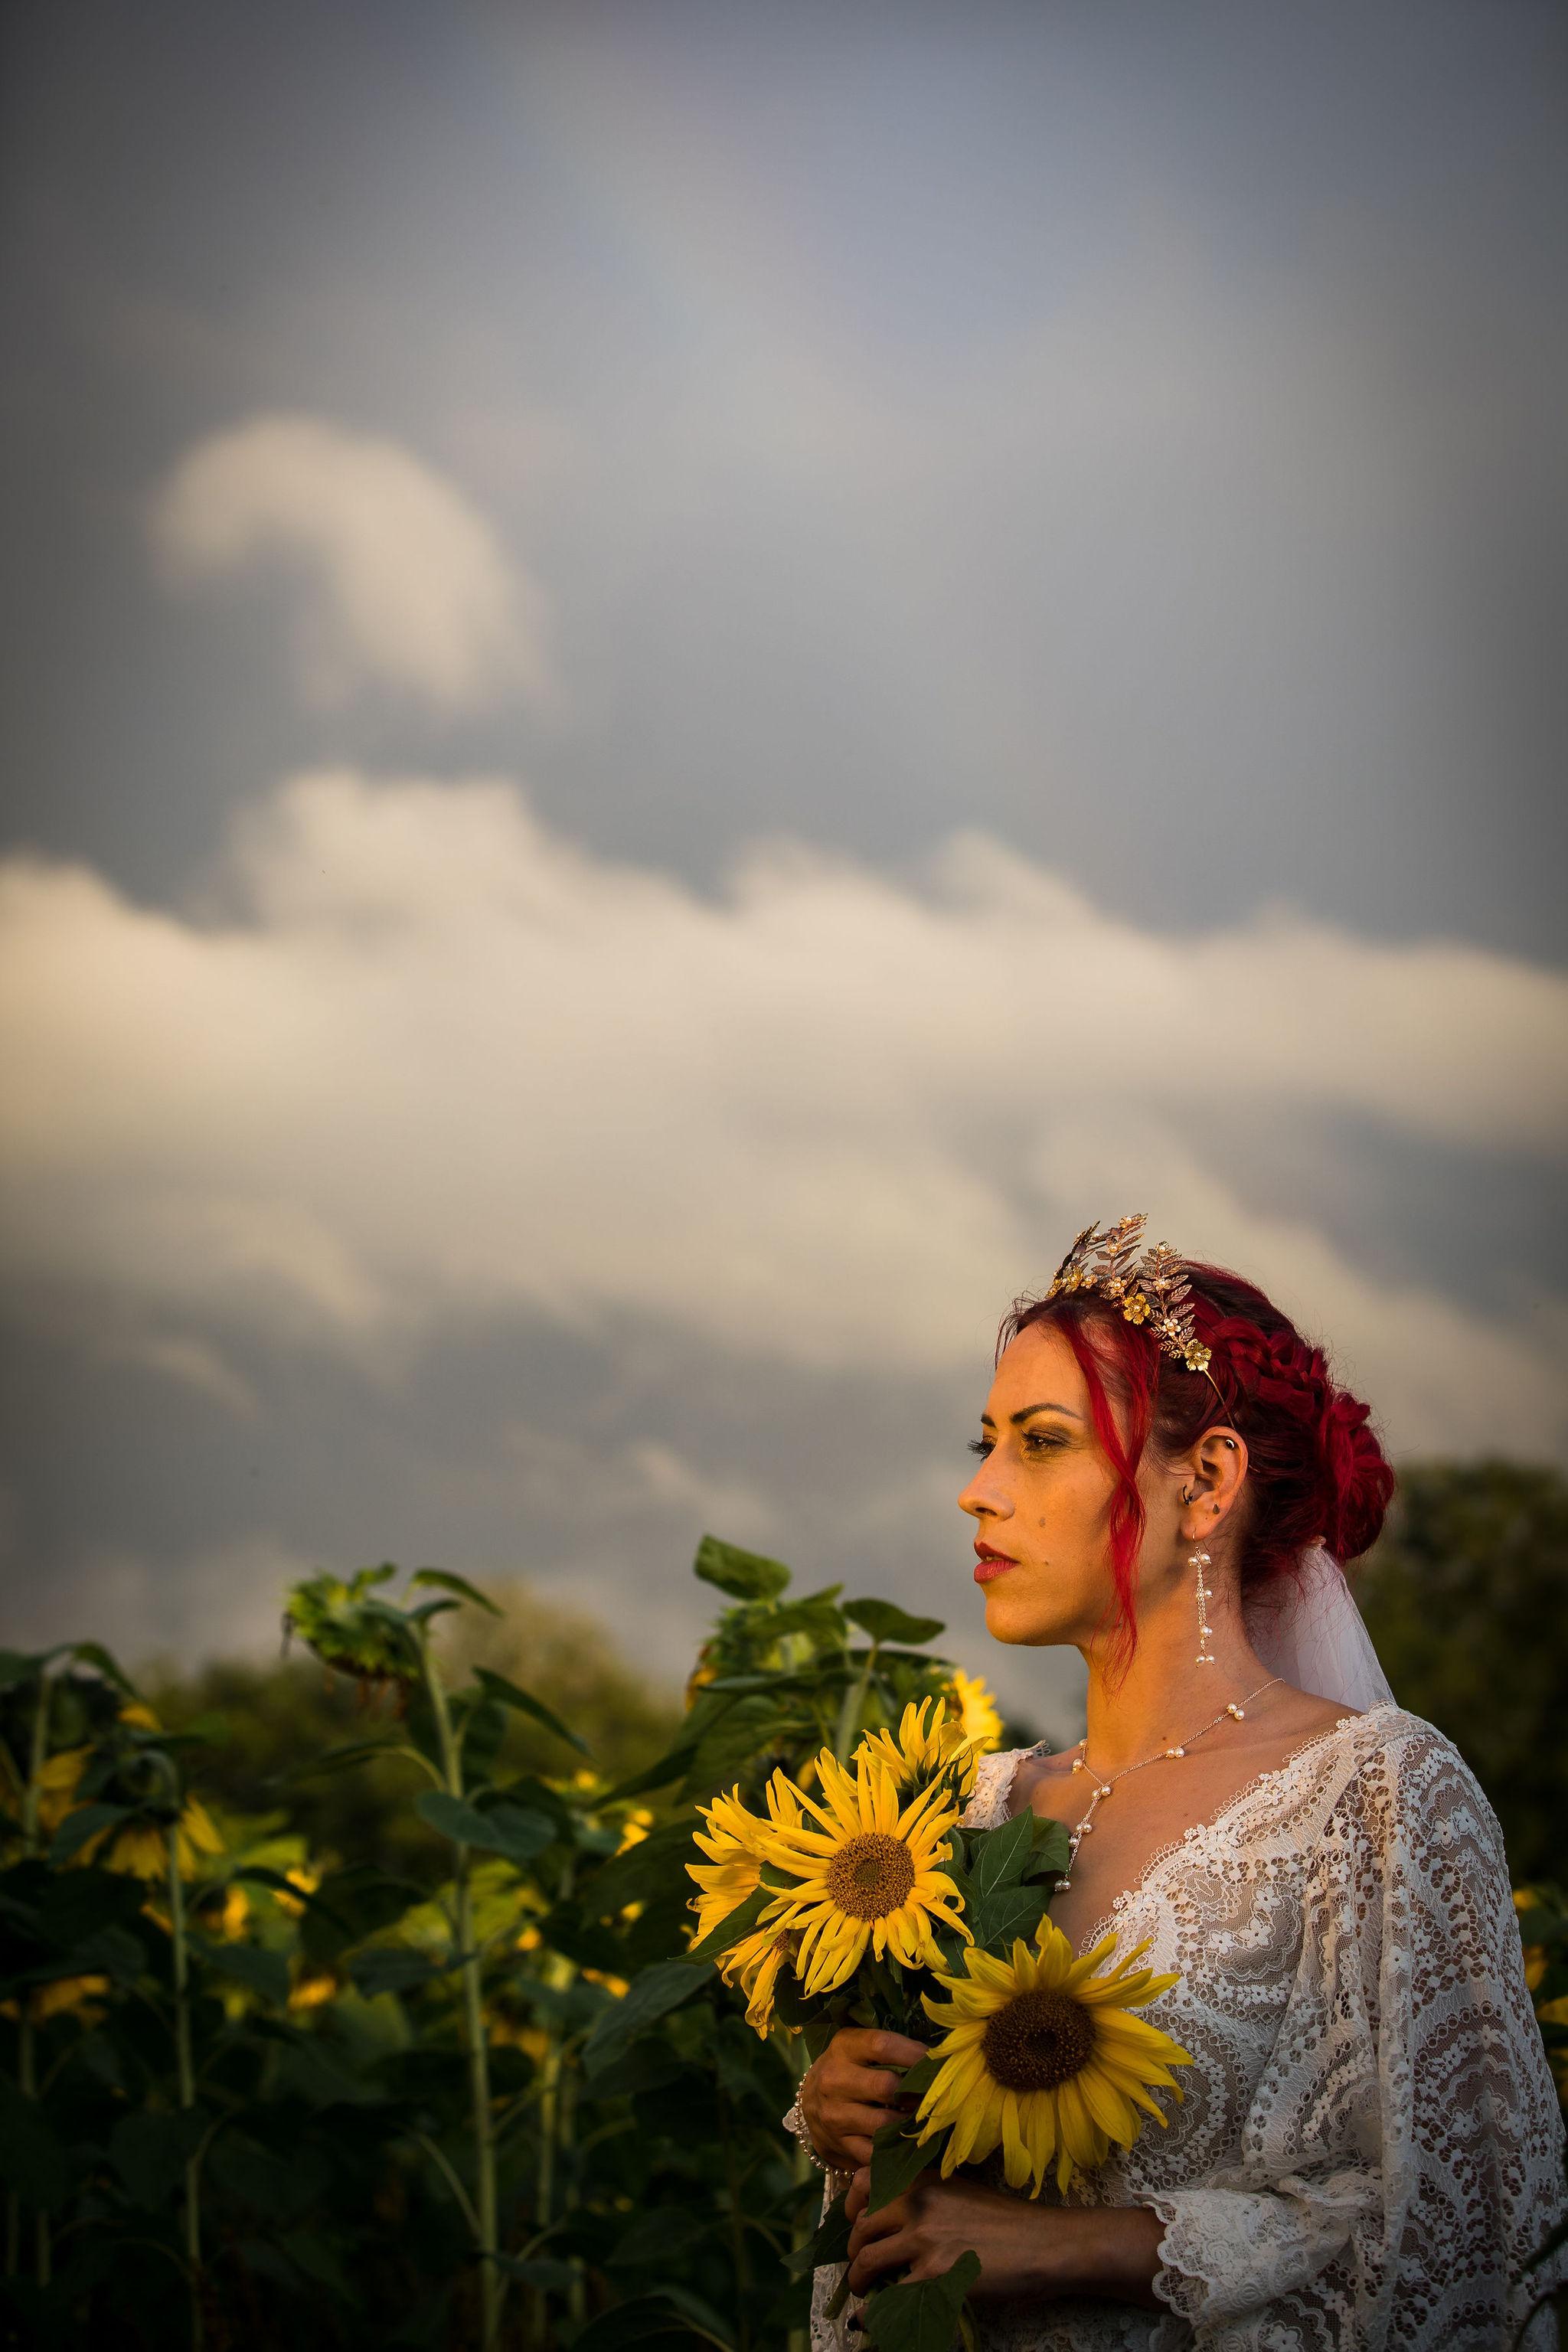 sunflower themed wedding - unconventional wedding - sunflower wedding - autumn wedding - alternative wedding planning - bride holding sunflowers